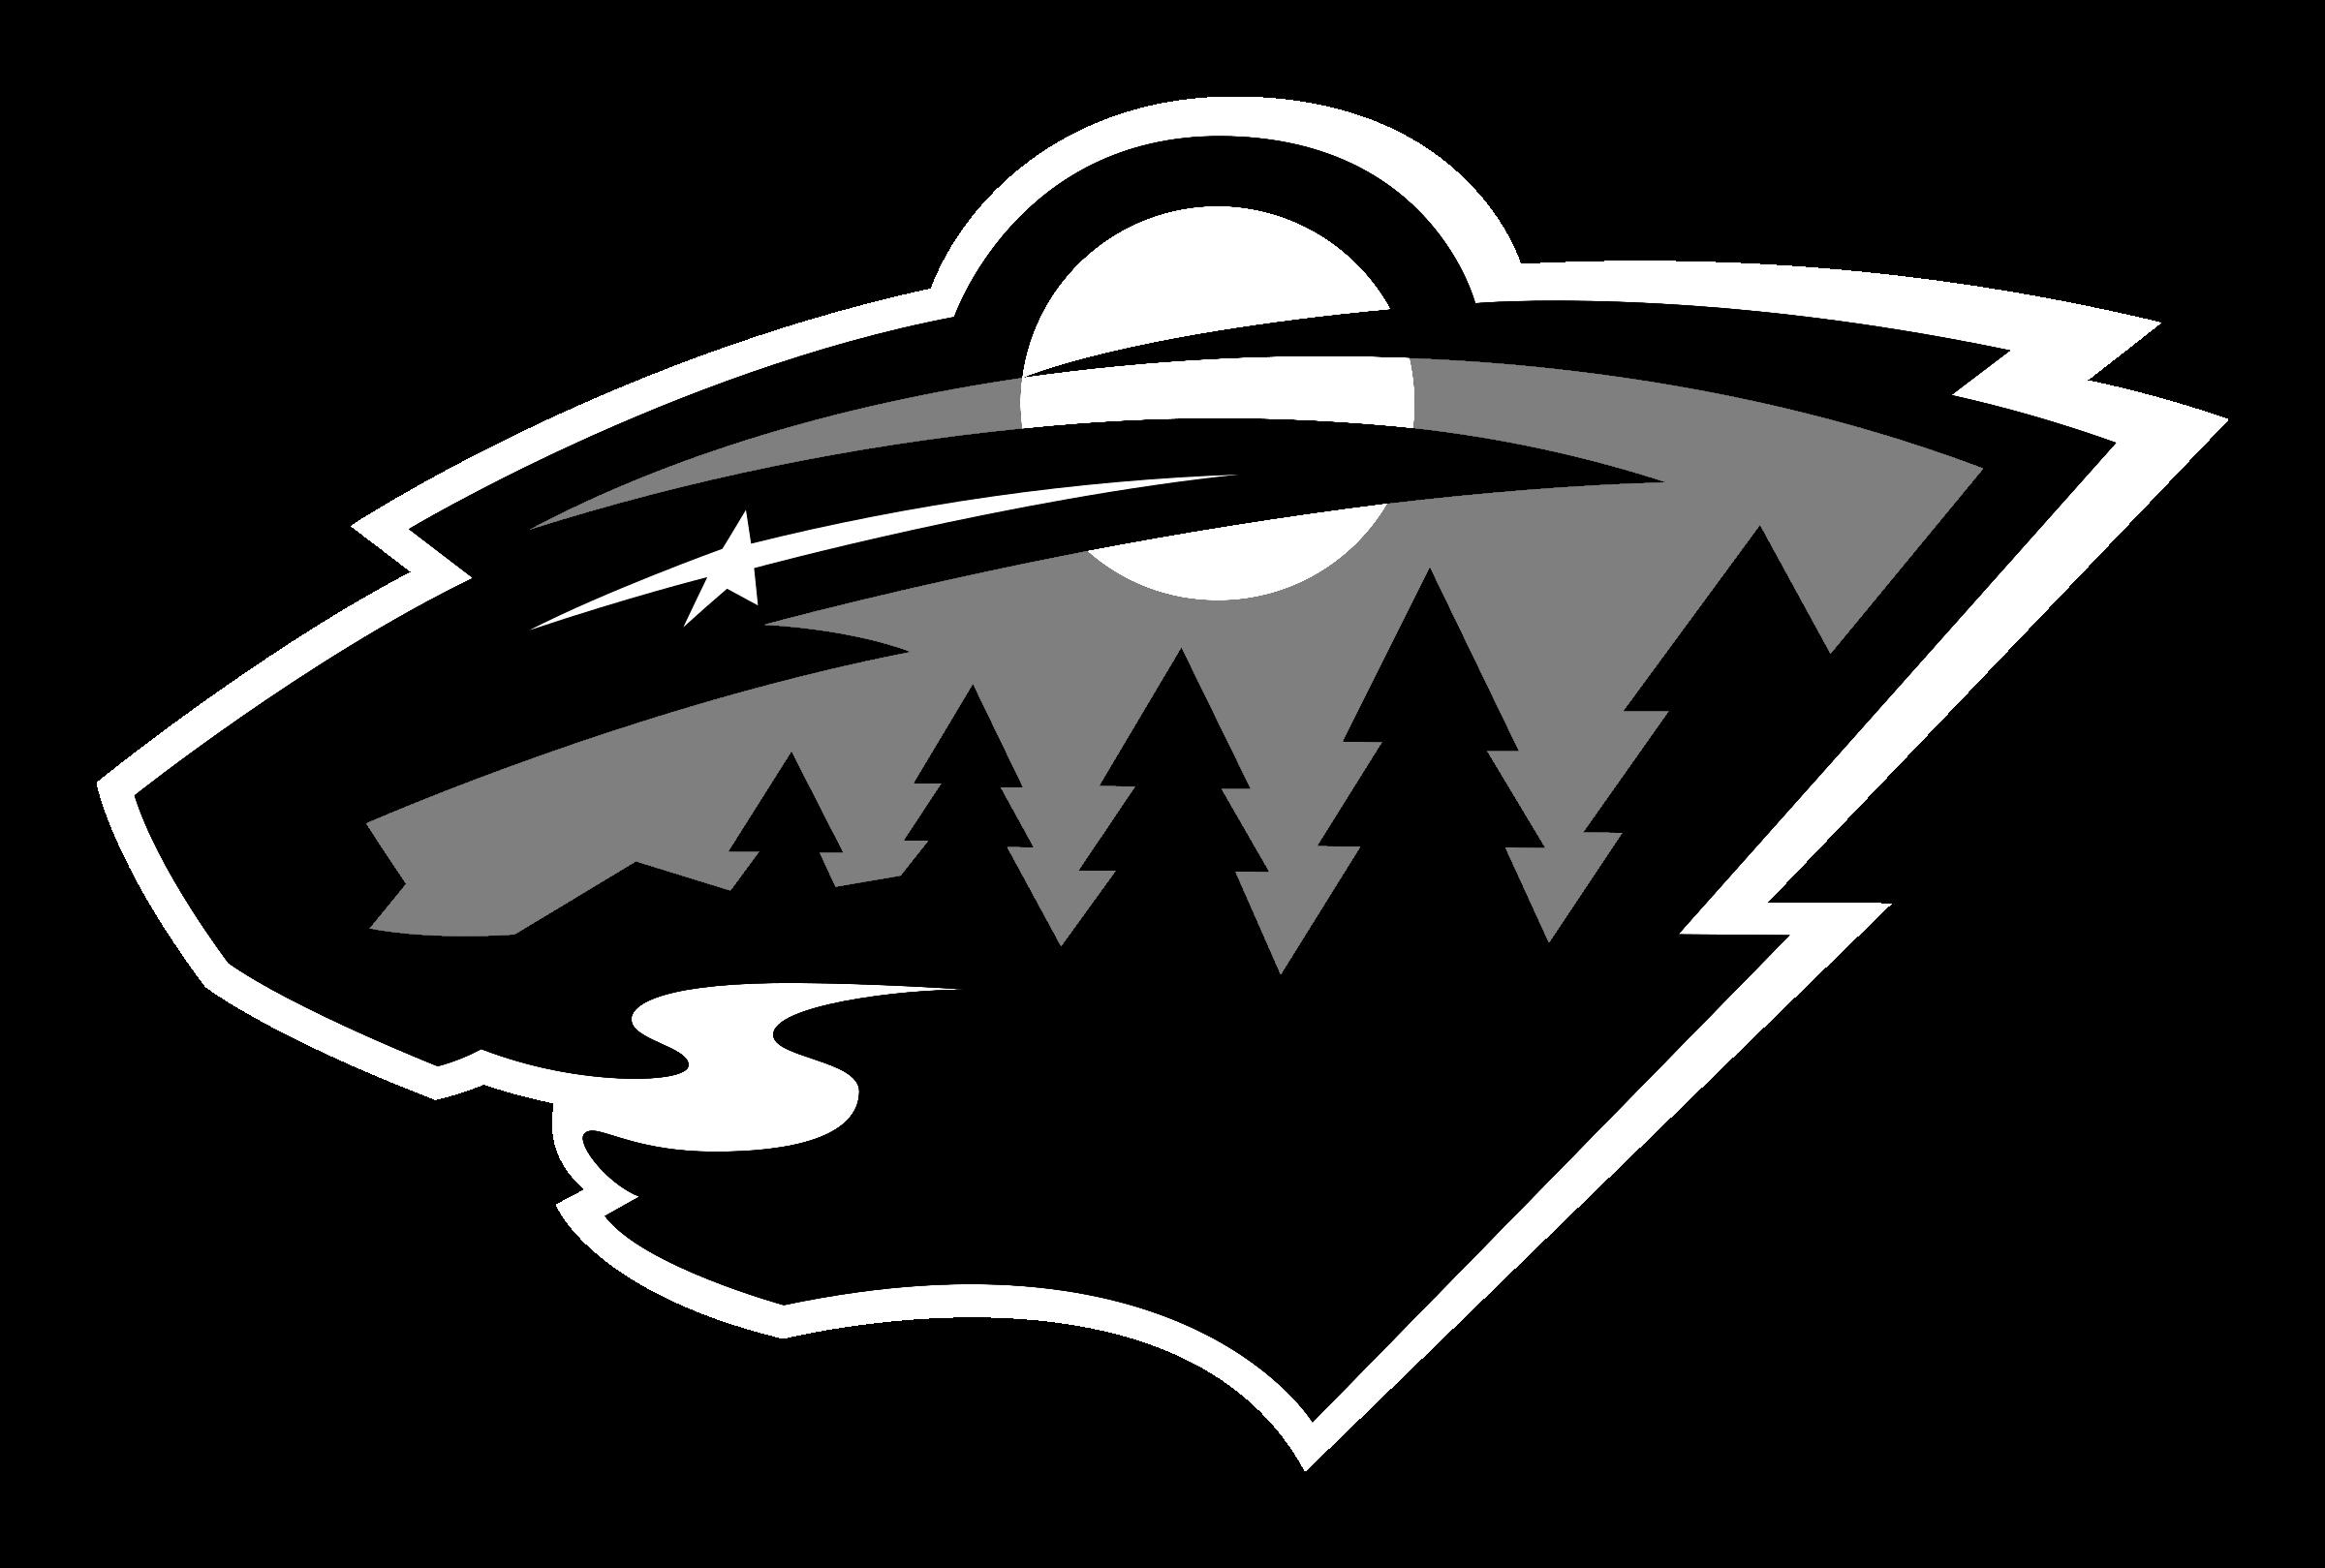 Minnesota Wild logo black and white.